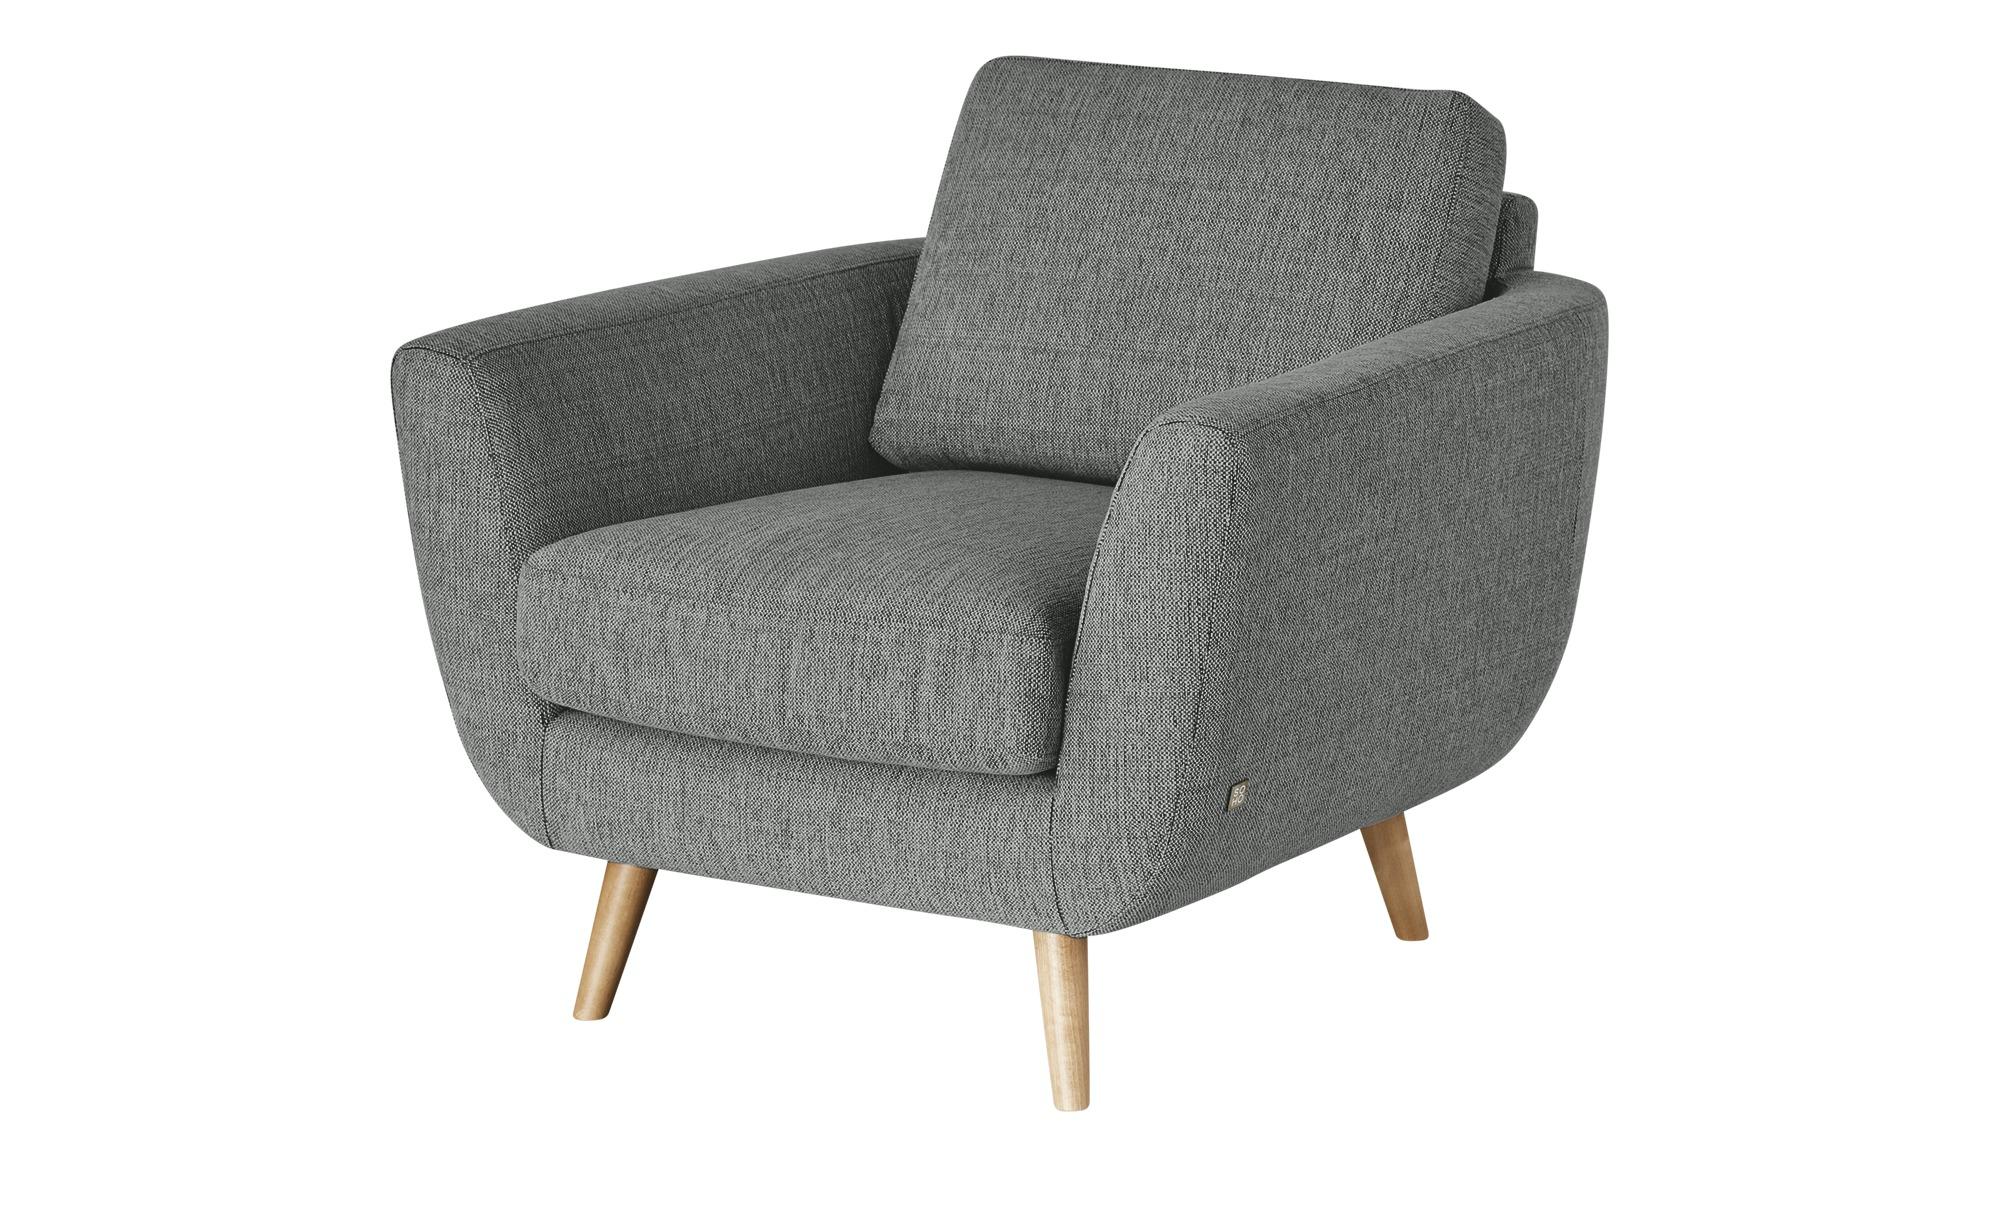 SOHO Sessel  Smilla ¦ grau ¦ Maße (cm): B: 94 H: 85 T: 93 Polstermöbel > Sessel > Ohrensessel - Höffner